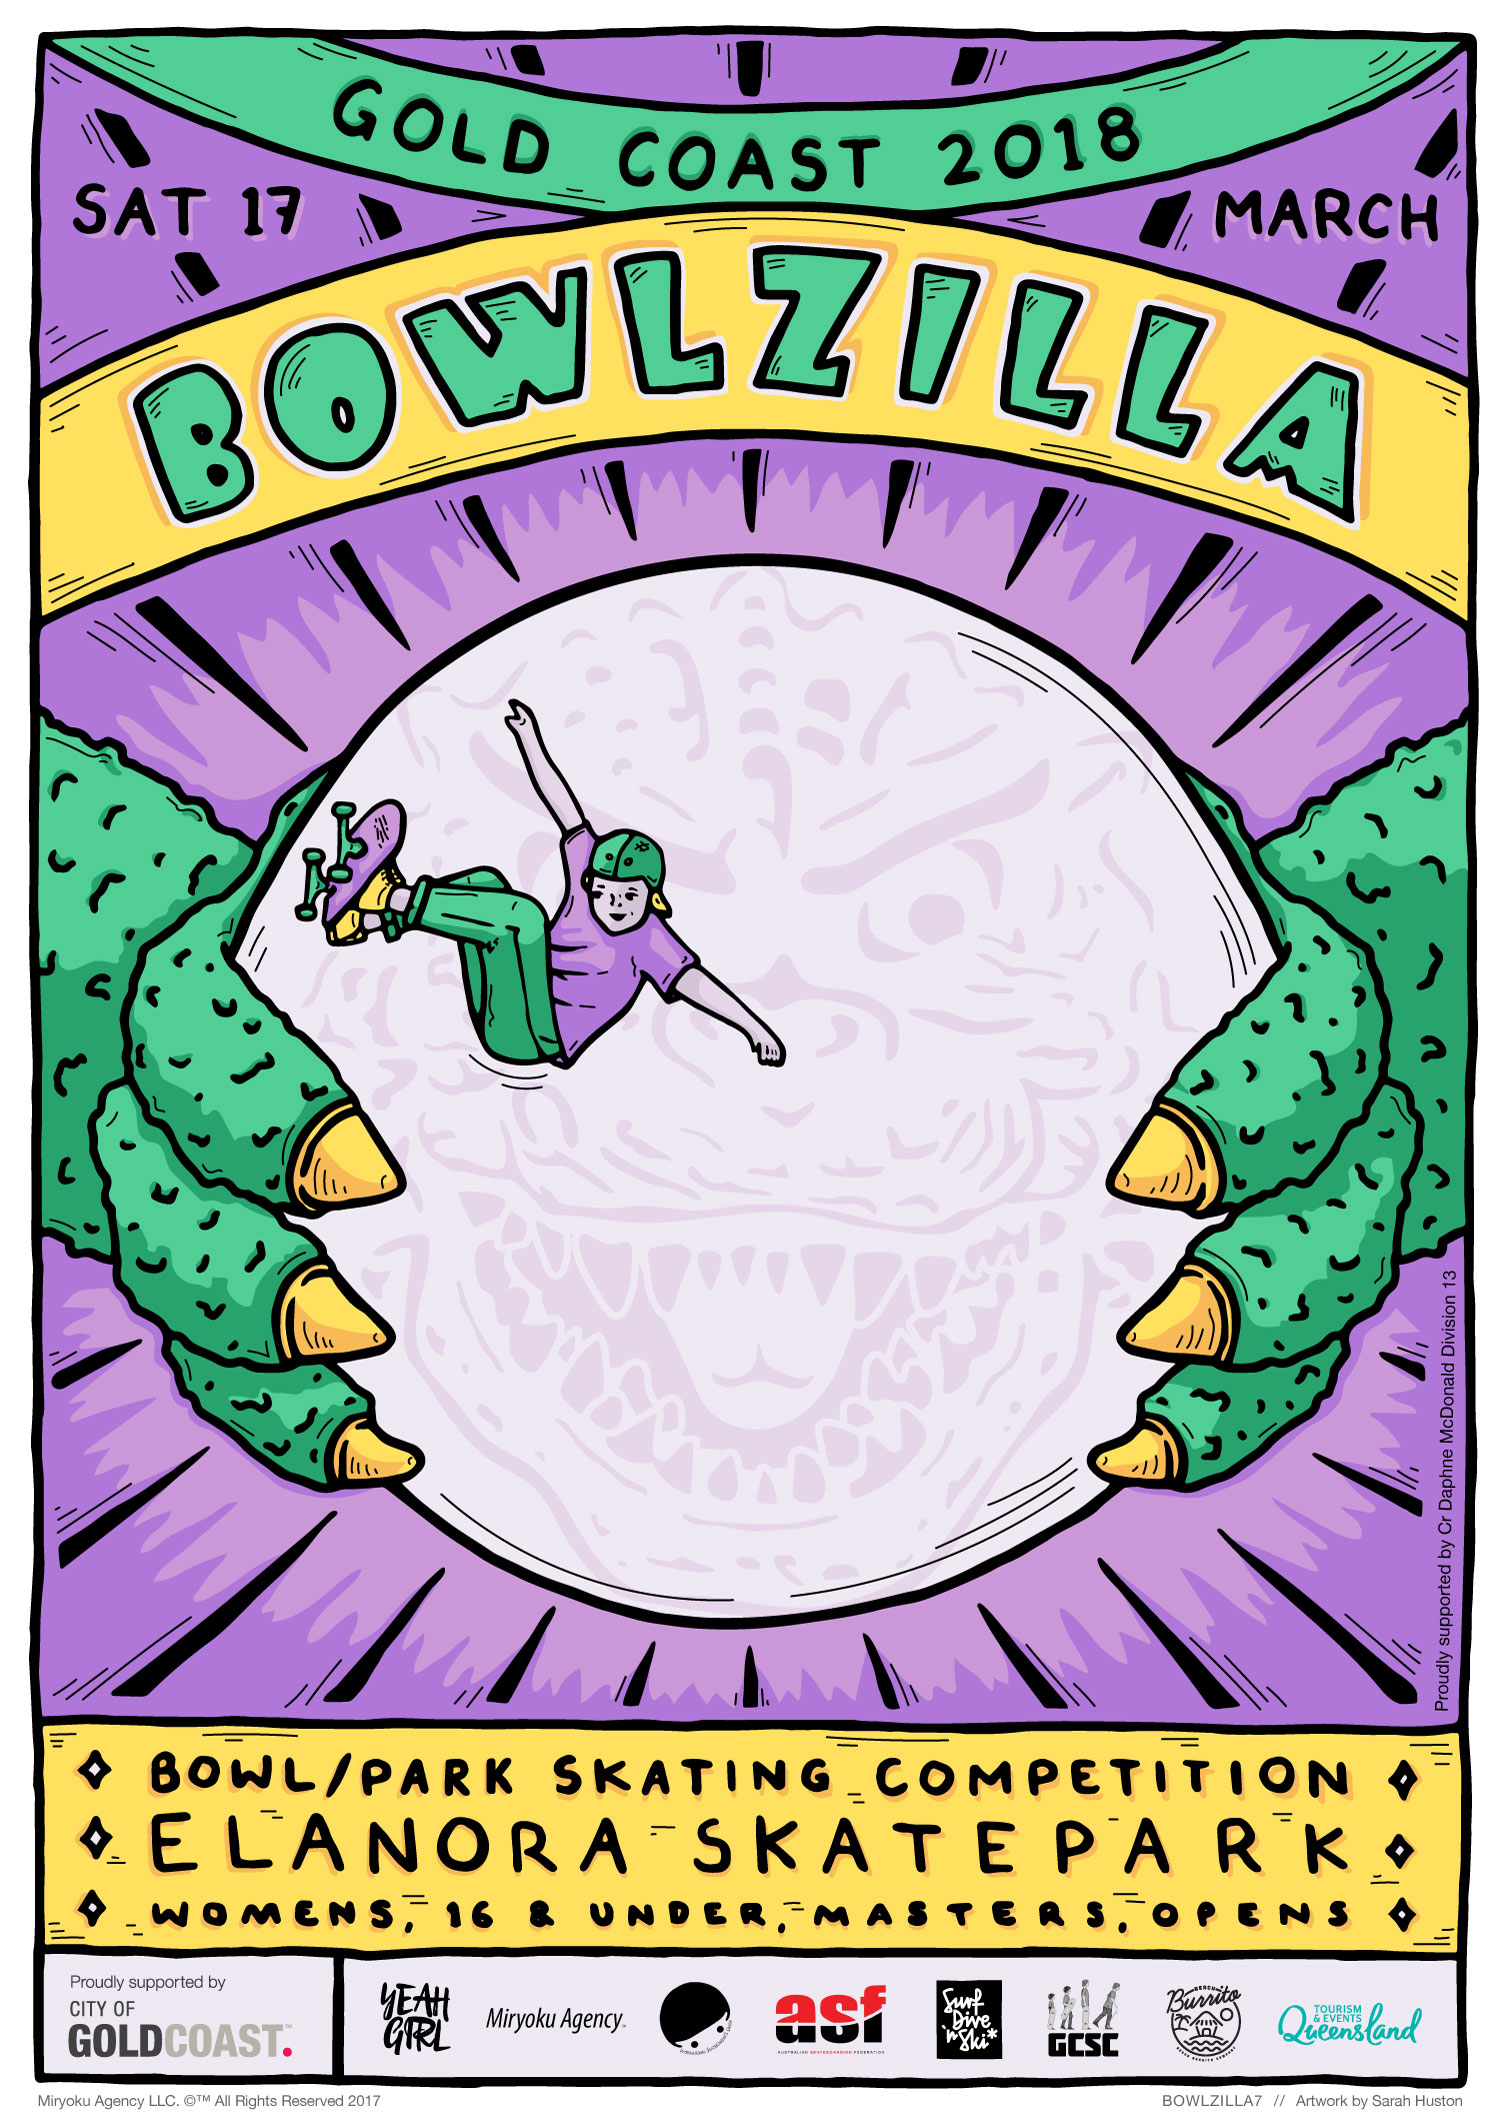 BOWLZILLA18-A3-Poster-Portrait-Web-1500x2122.jpg